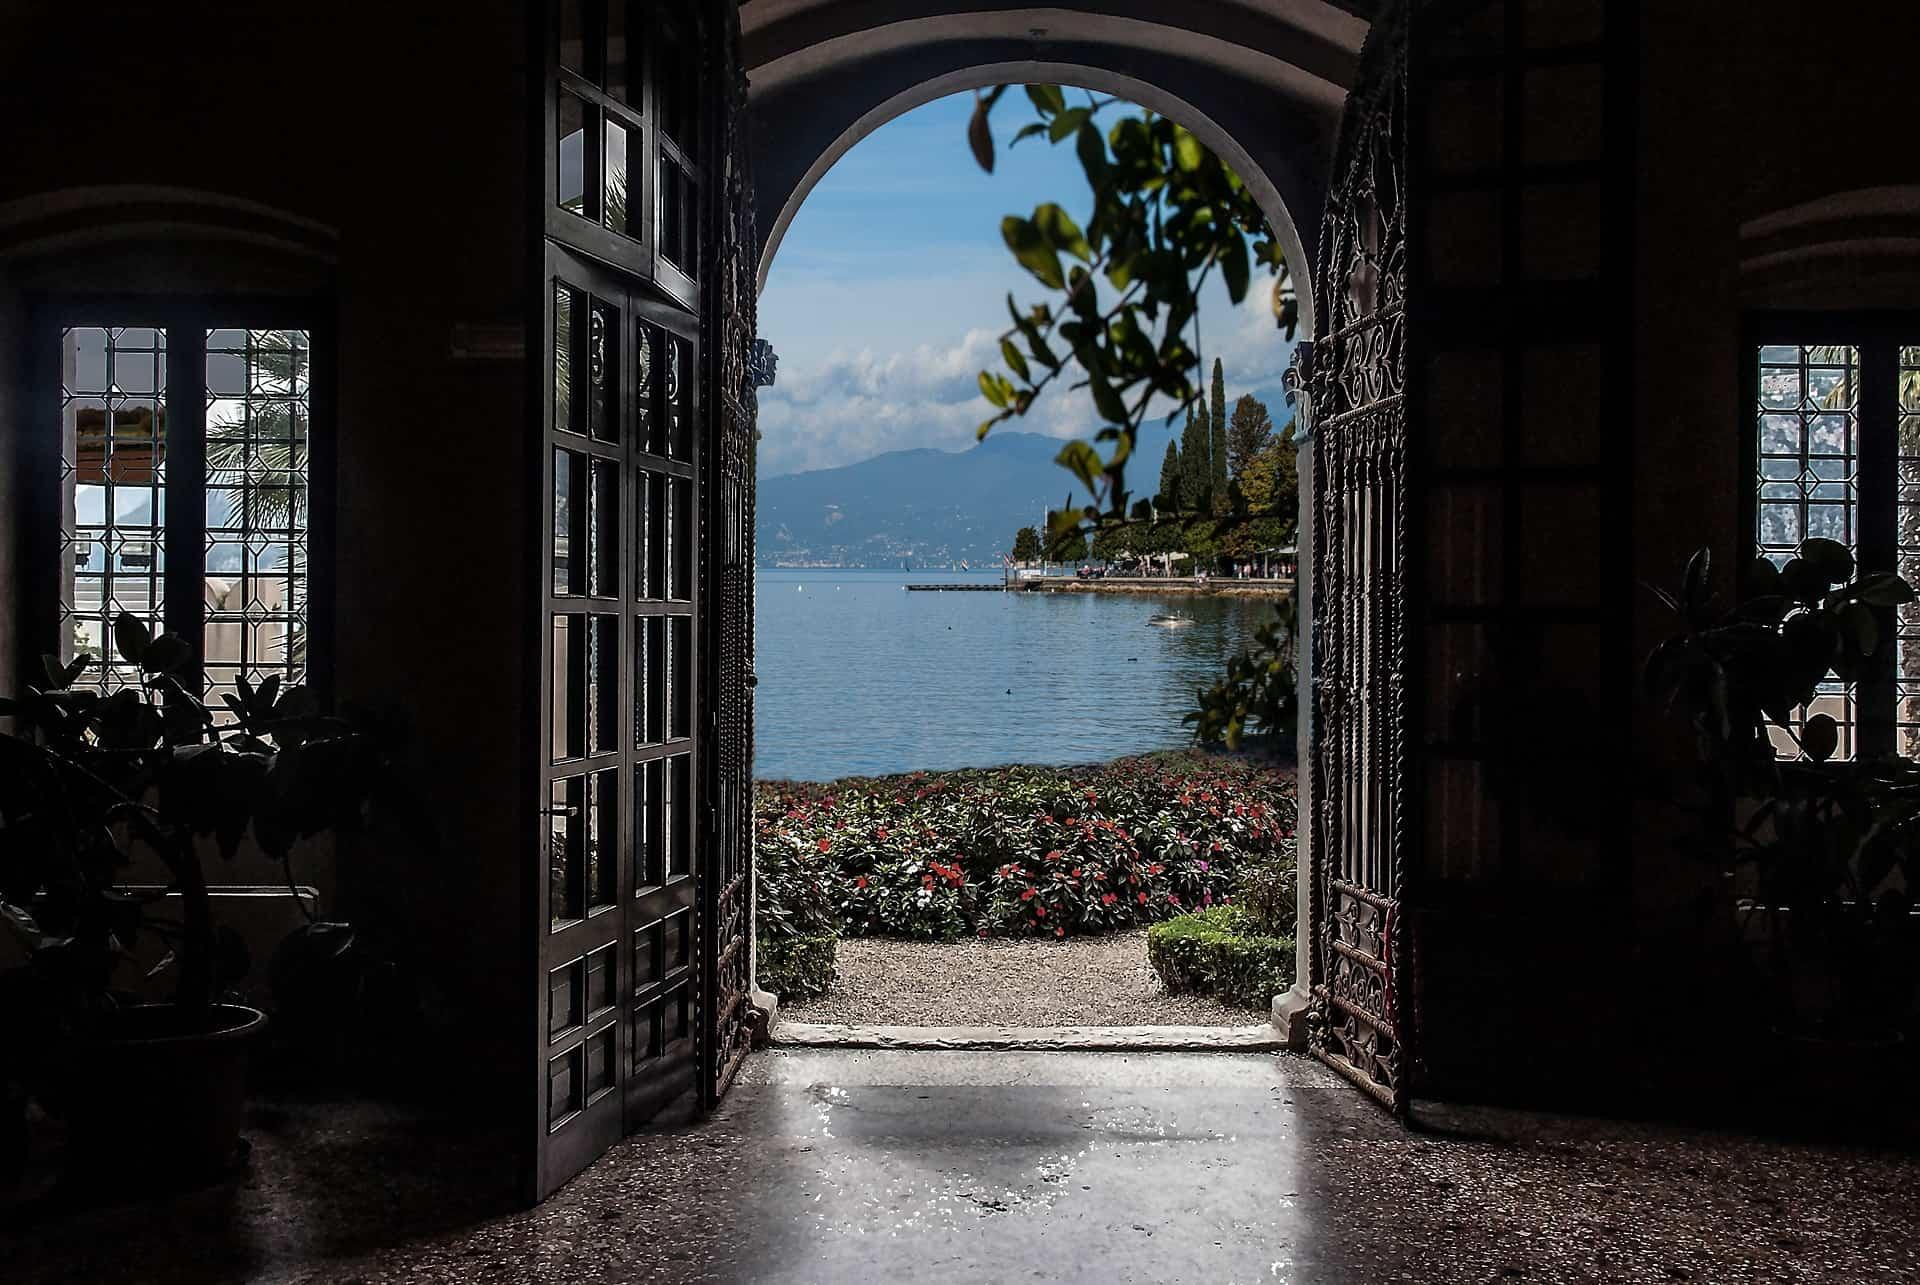 10 cose bellissime da fare nei dintorni di Verona